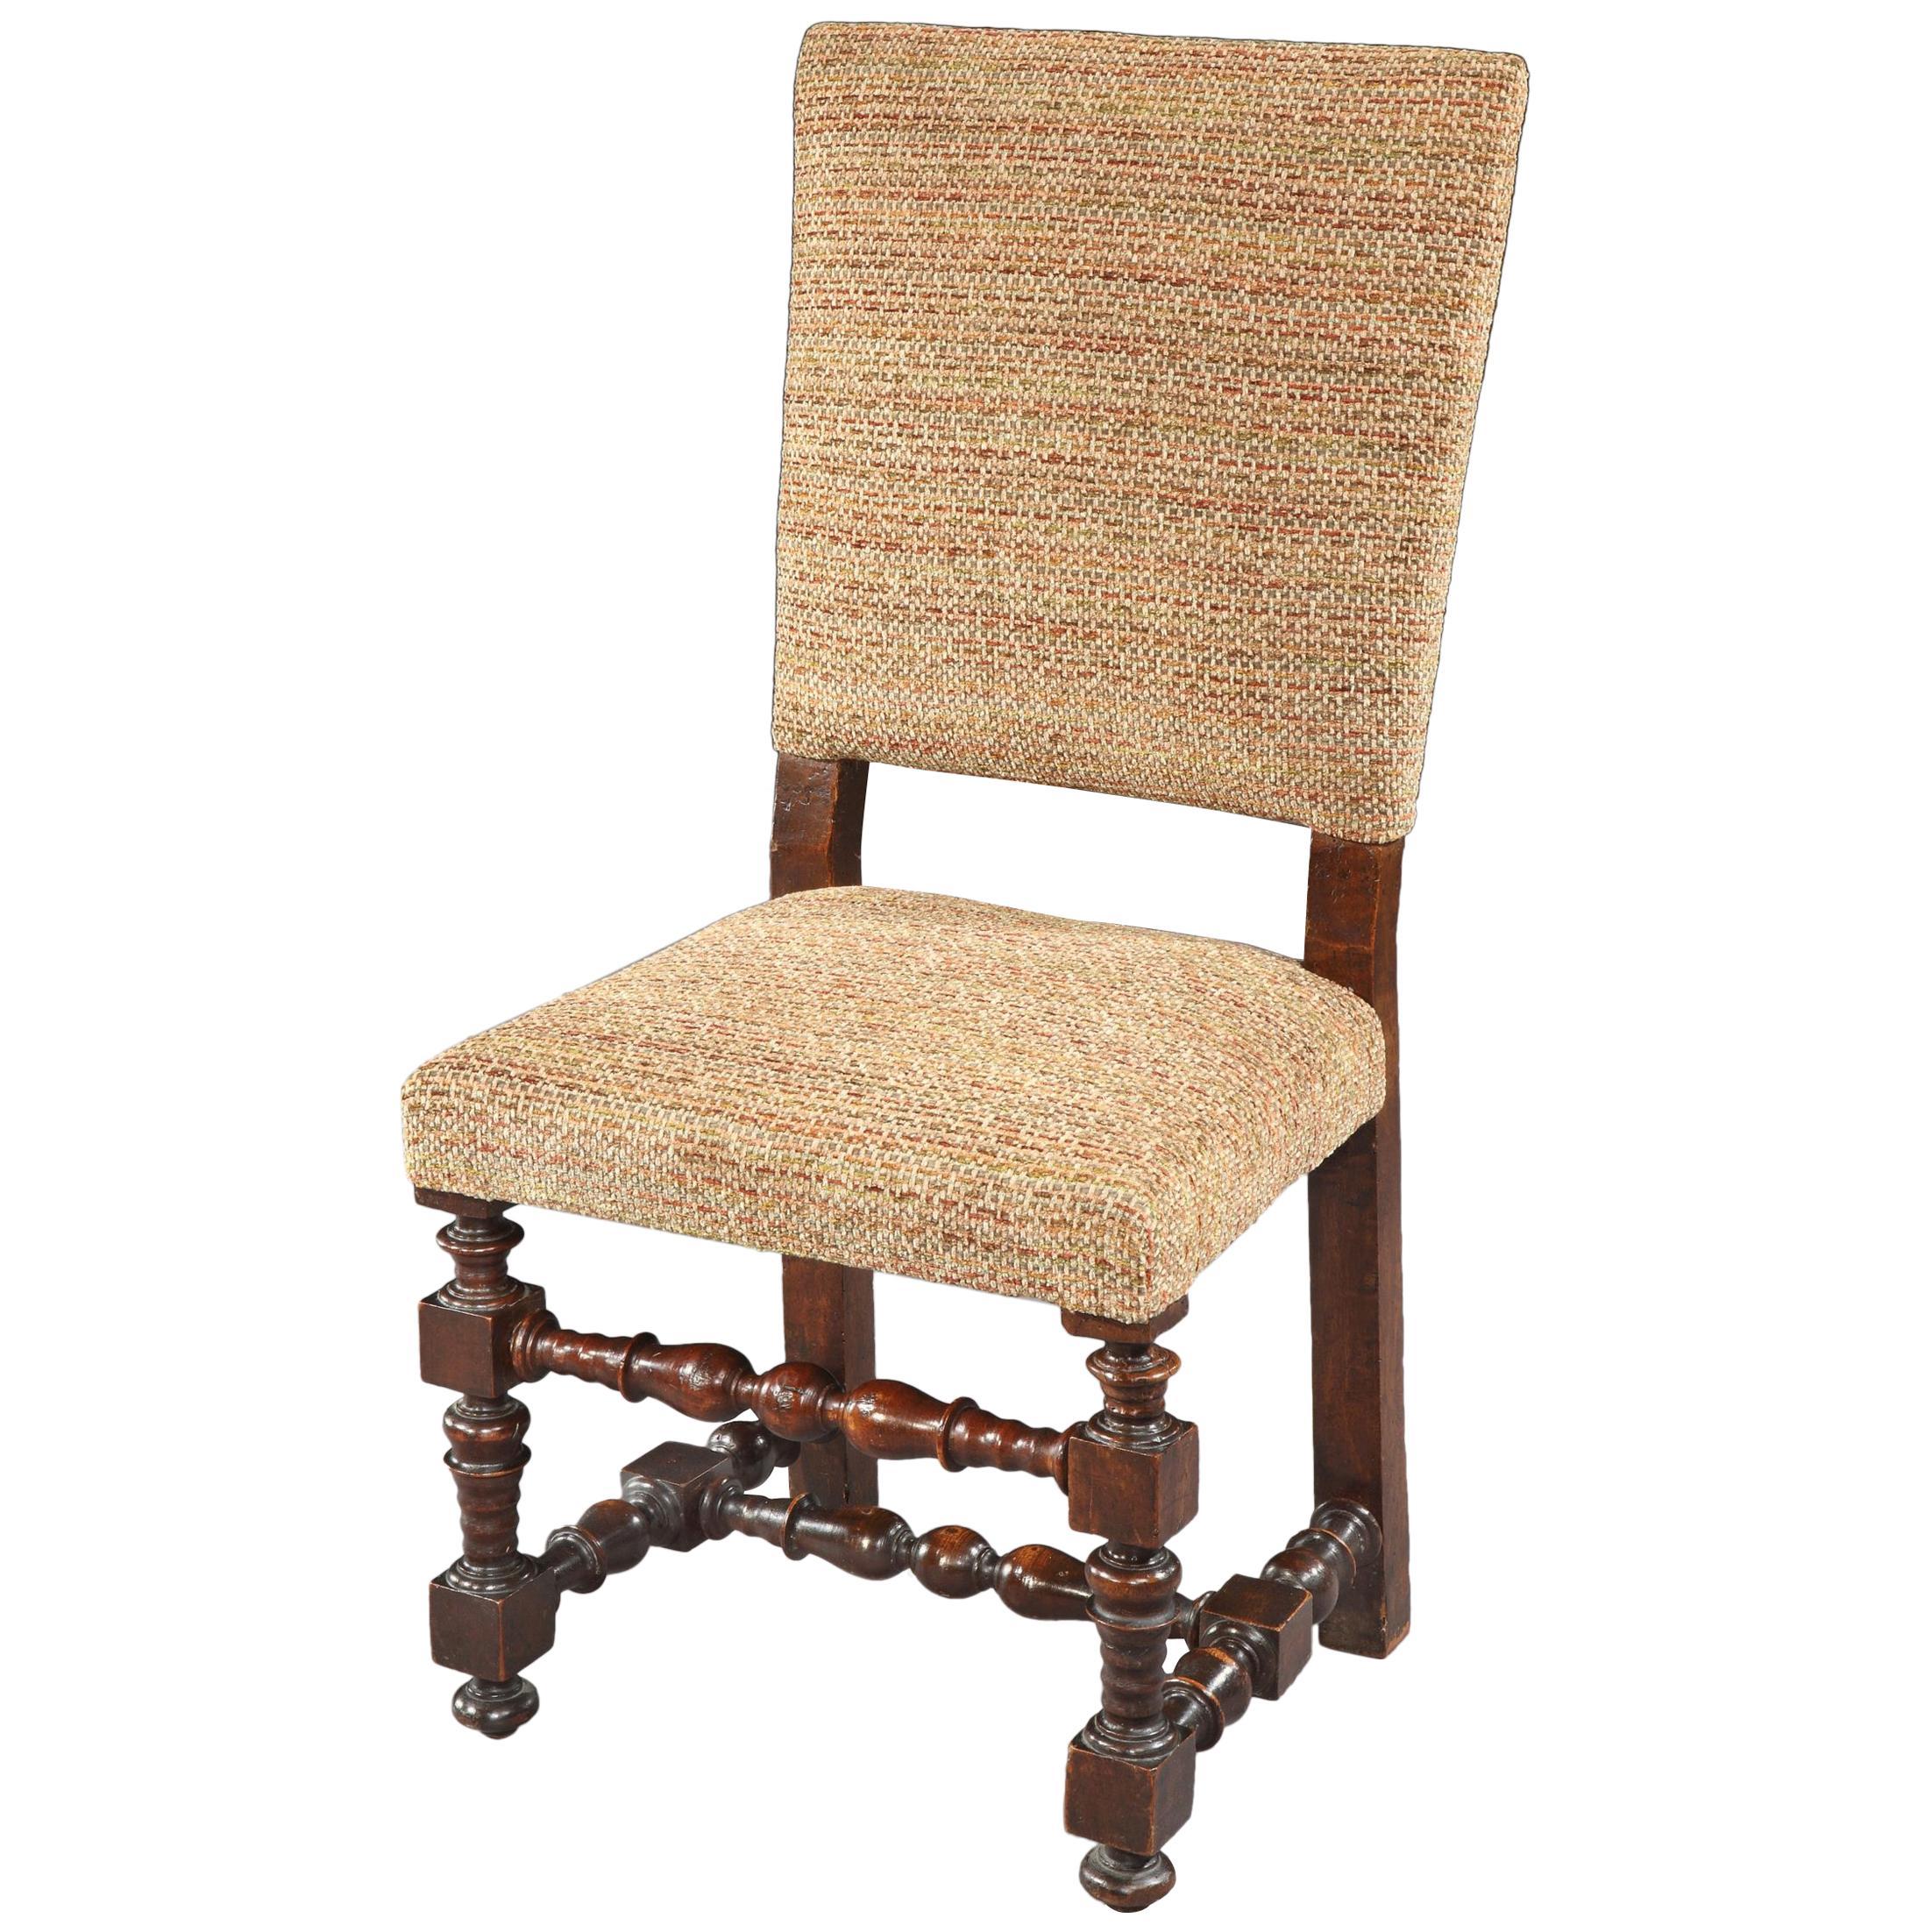 Chair, 19th century, Italian, Baroque, walnut, upholstered, Missoni